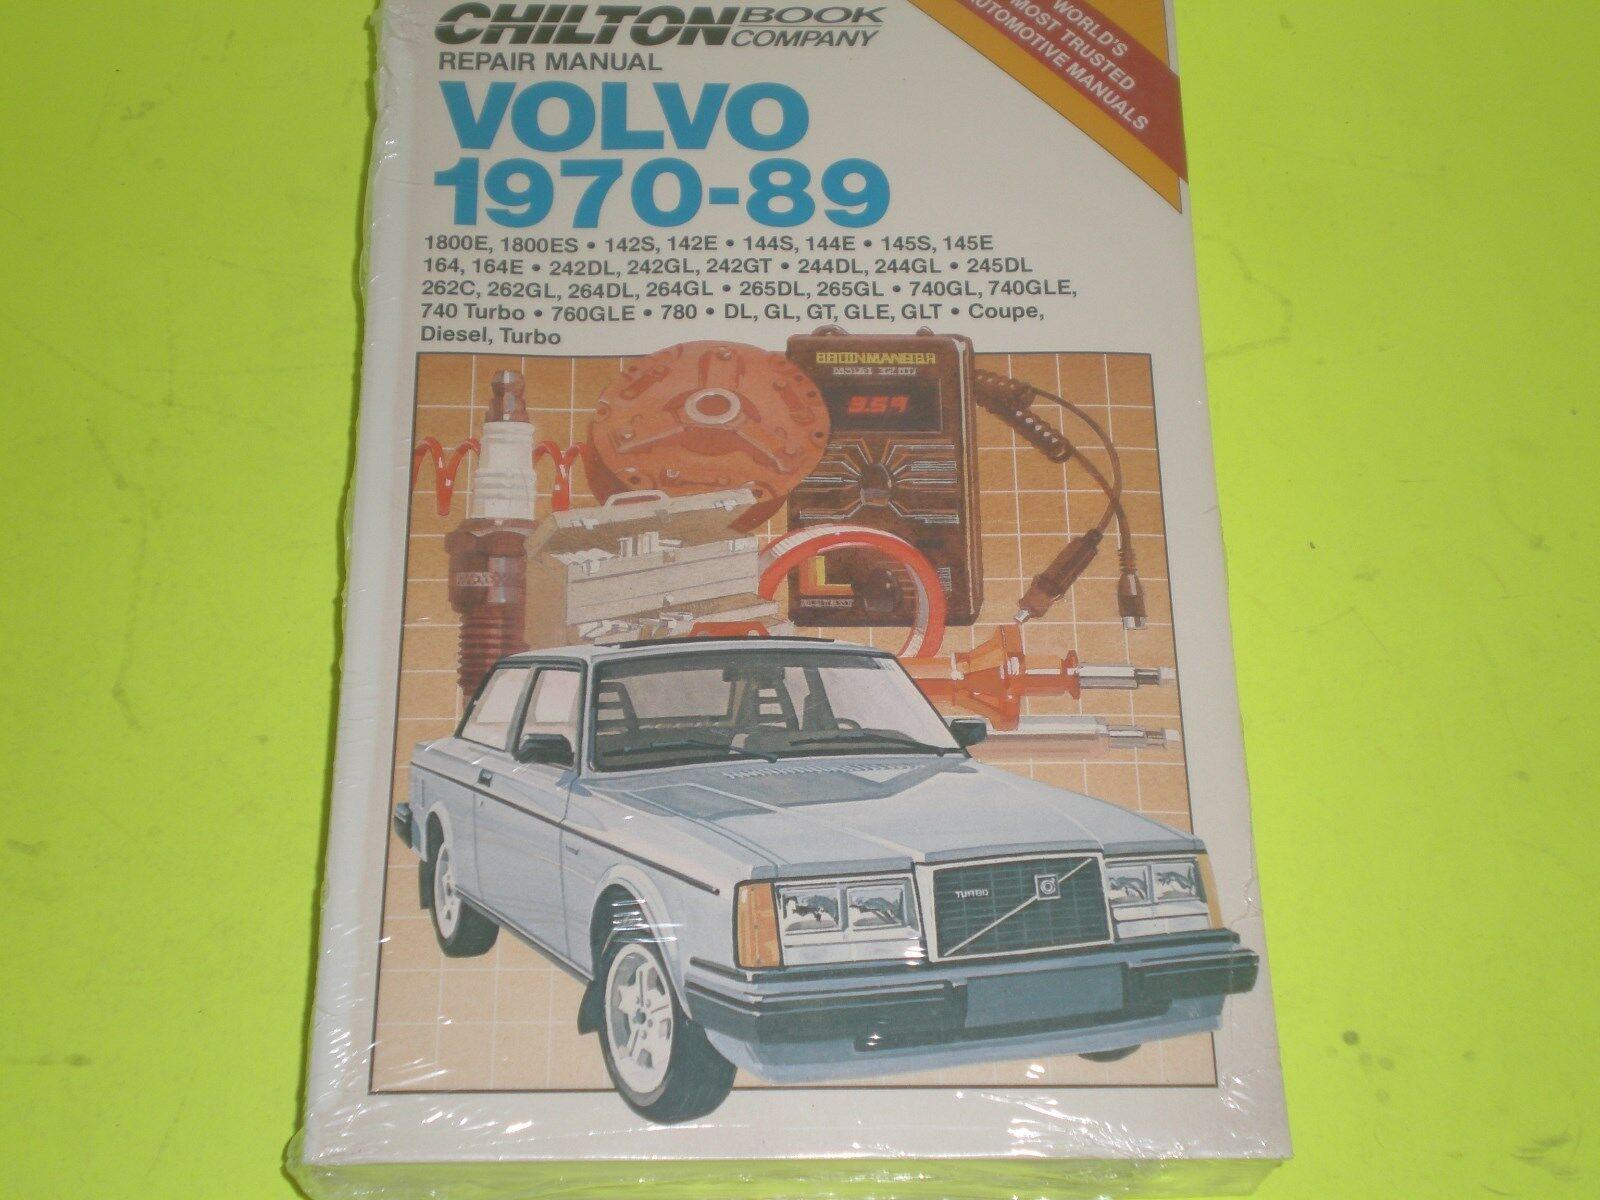 chilton auto repair manual volvo 1970 1989 many models 1800 142 144 rh ebay com Do Yourself Car Repair Manual Ford Auto Repair Manuals Online